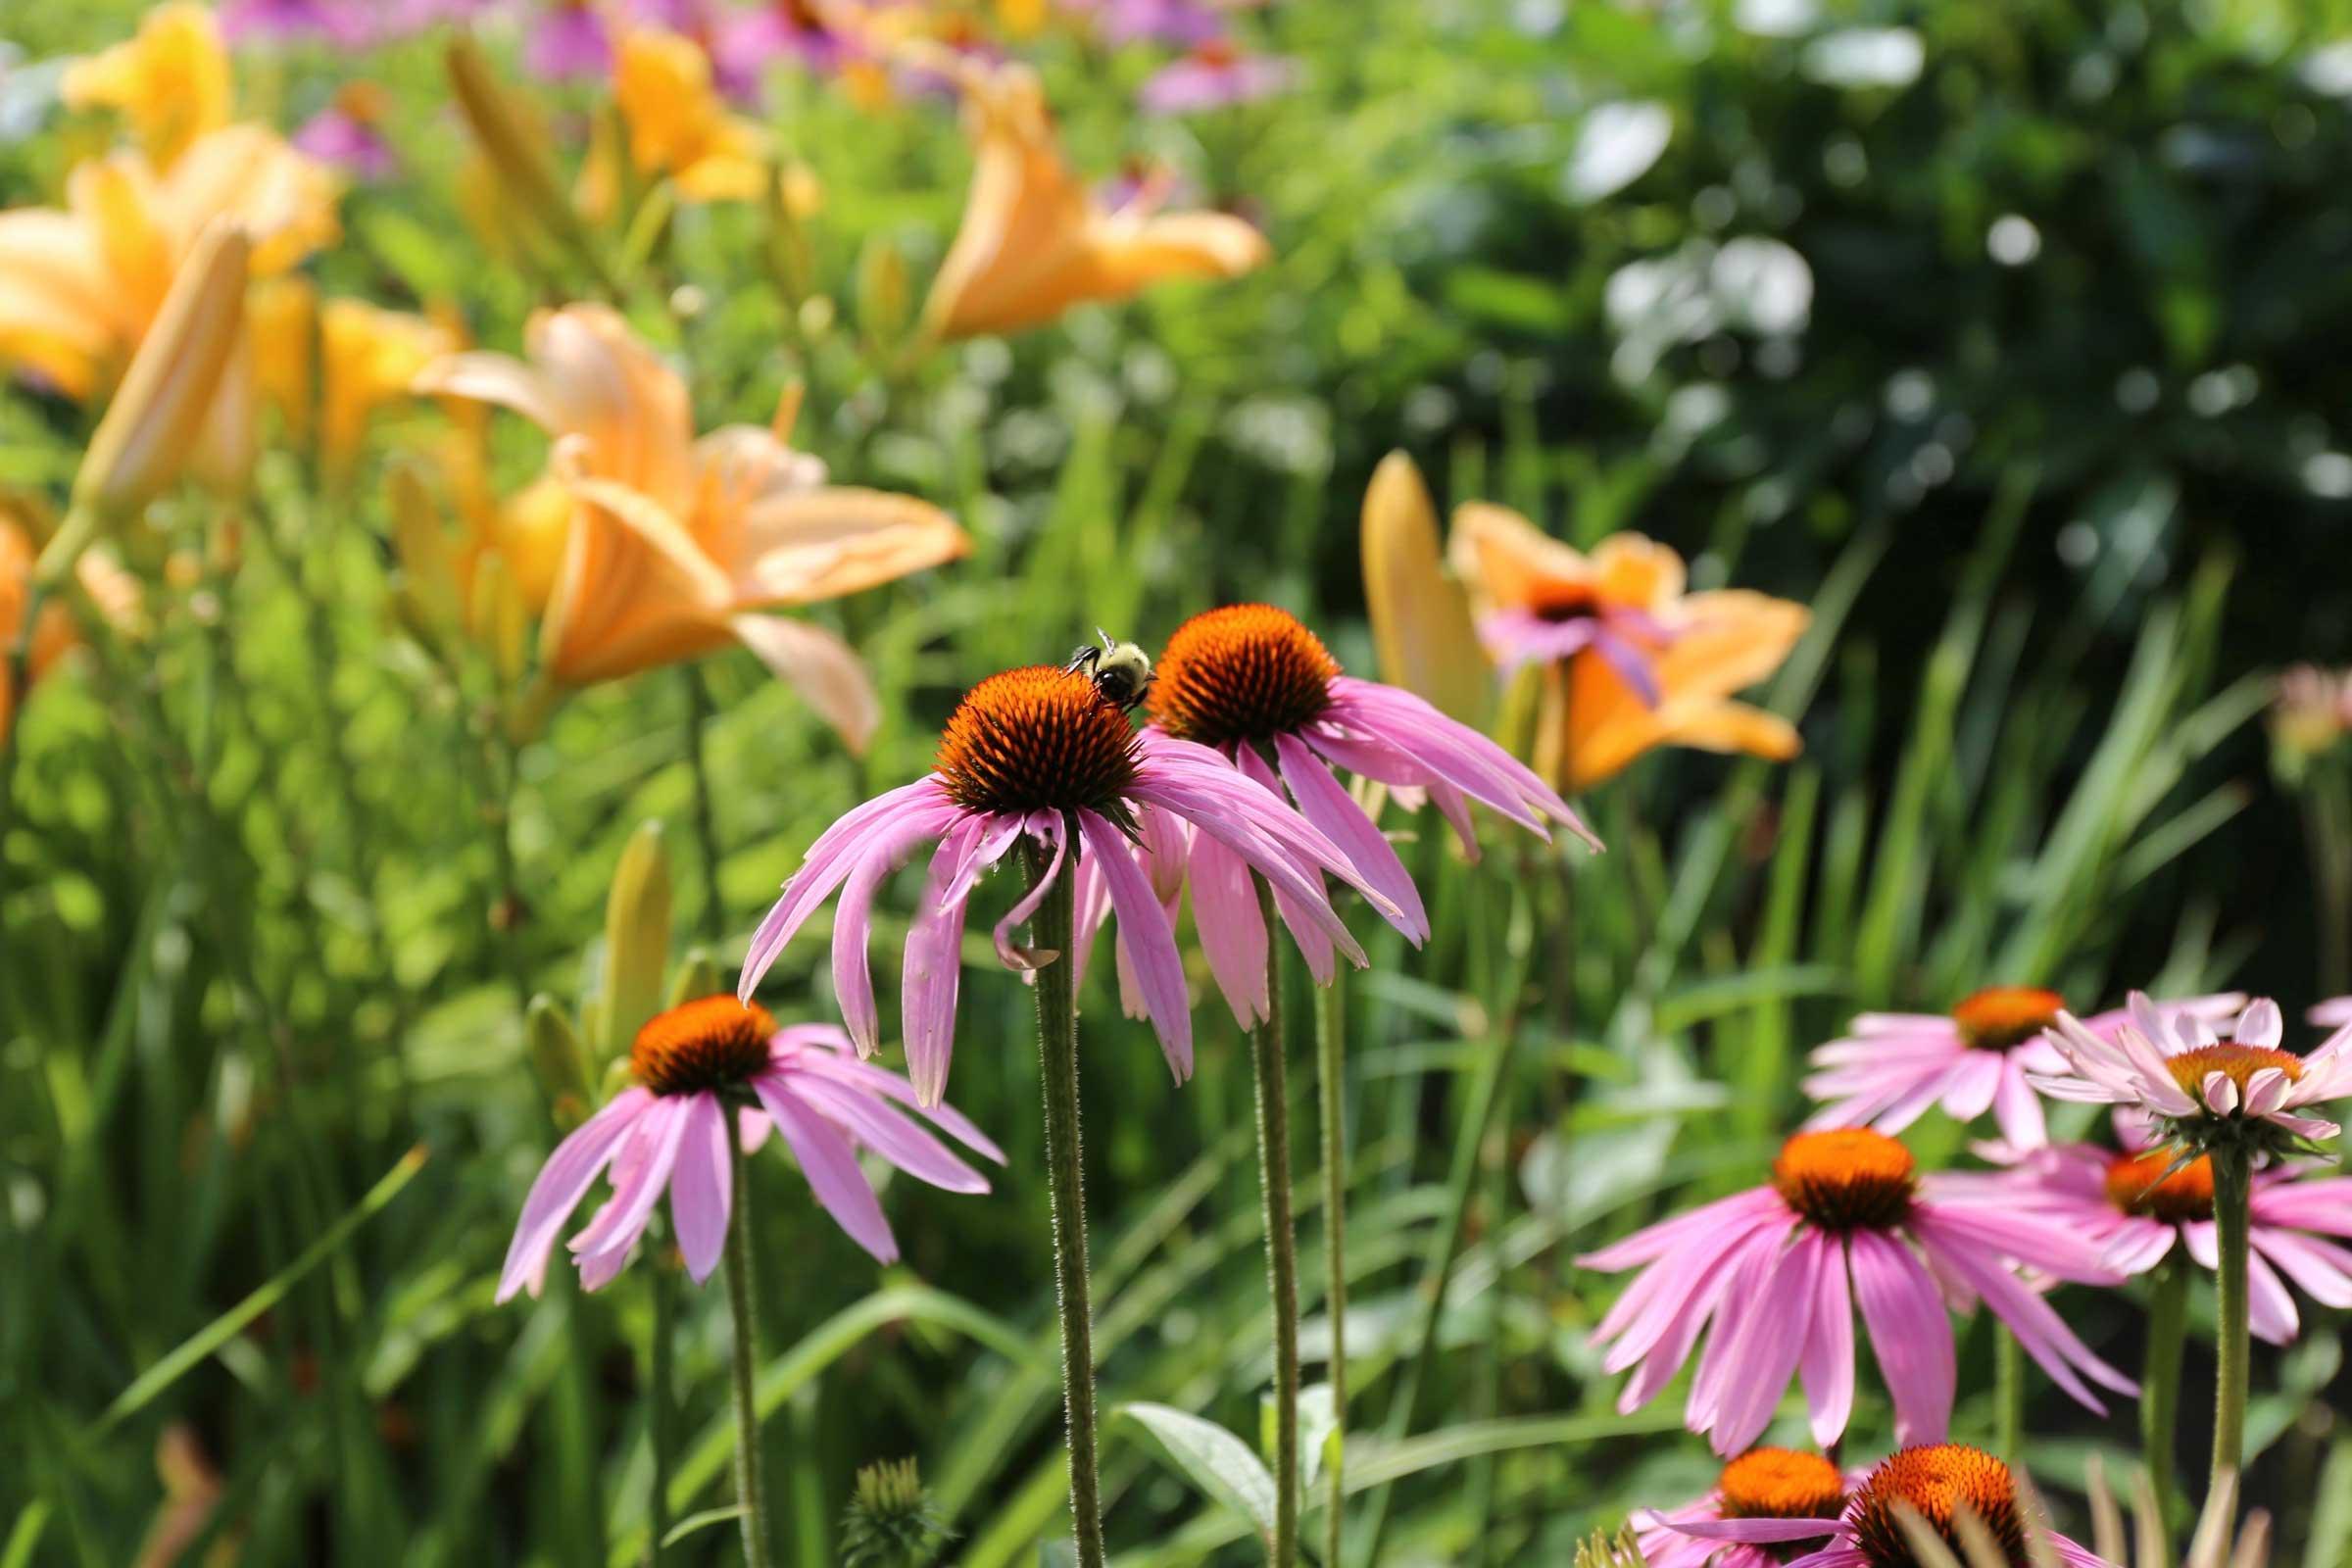 Perennial gardens maintenance tips for july garden pics for Perennial garden maintenance